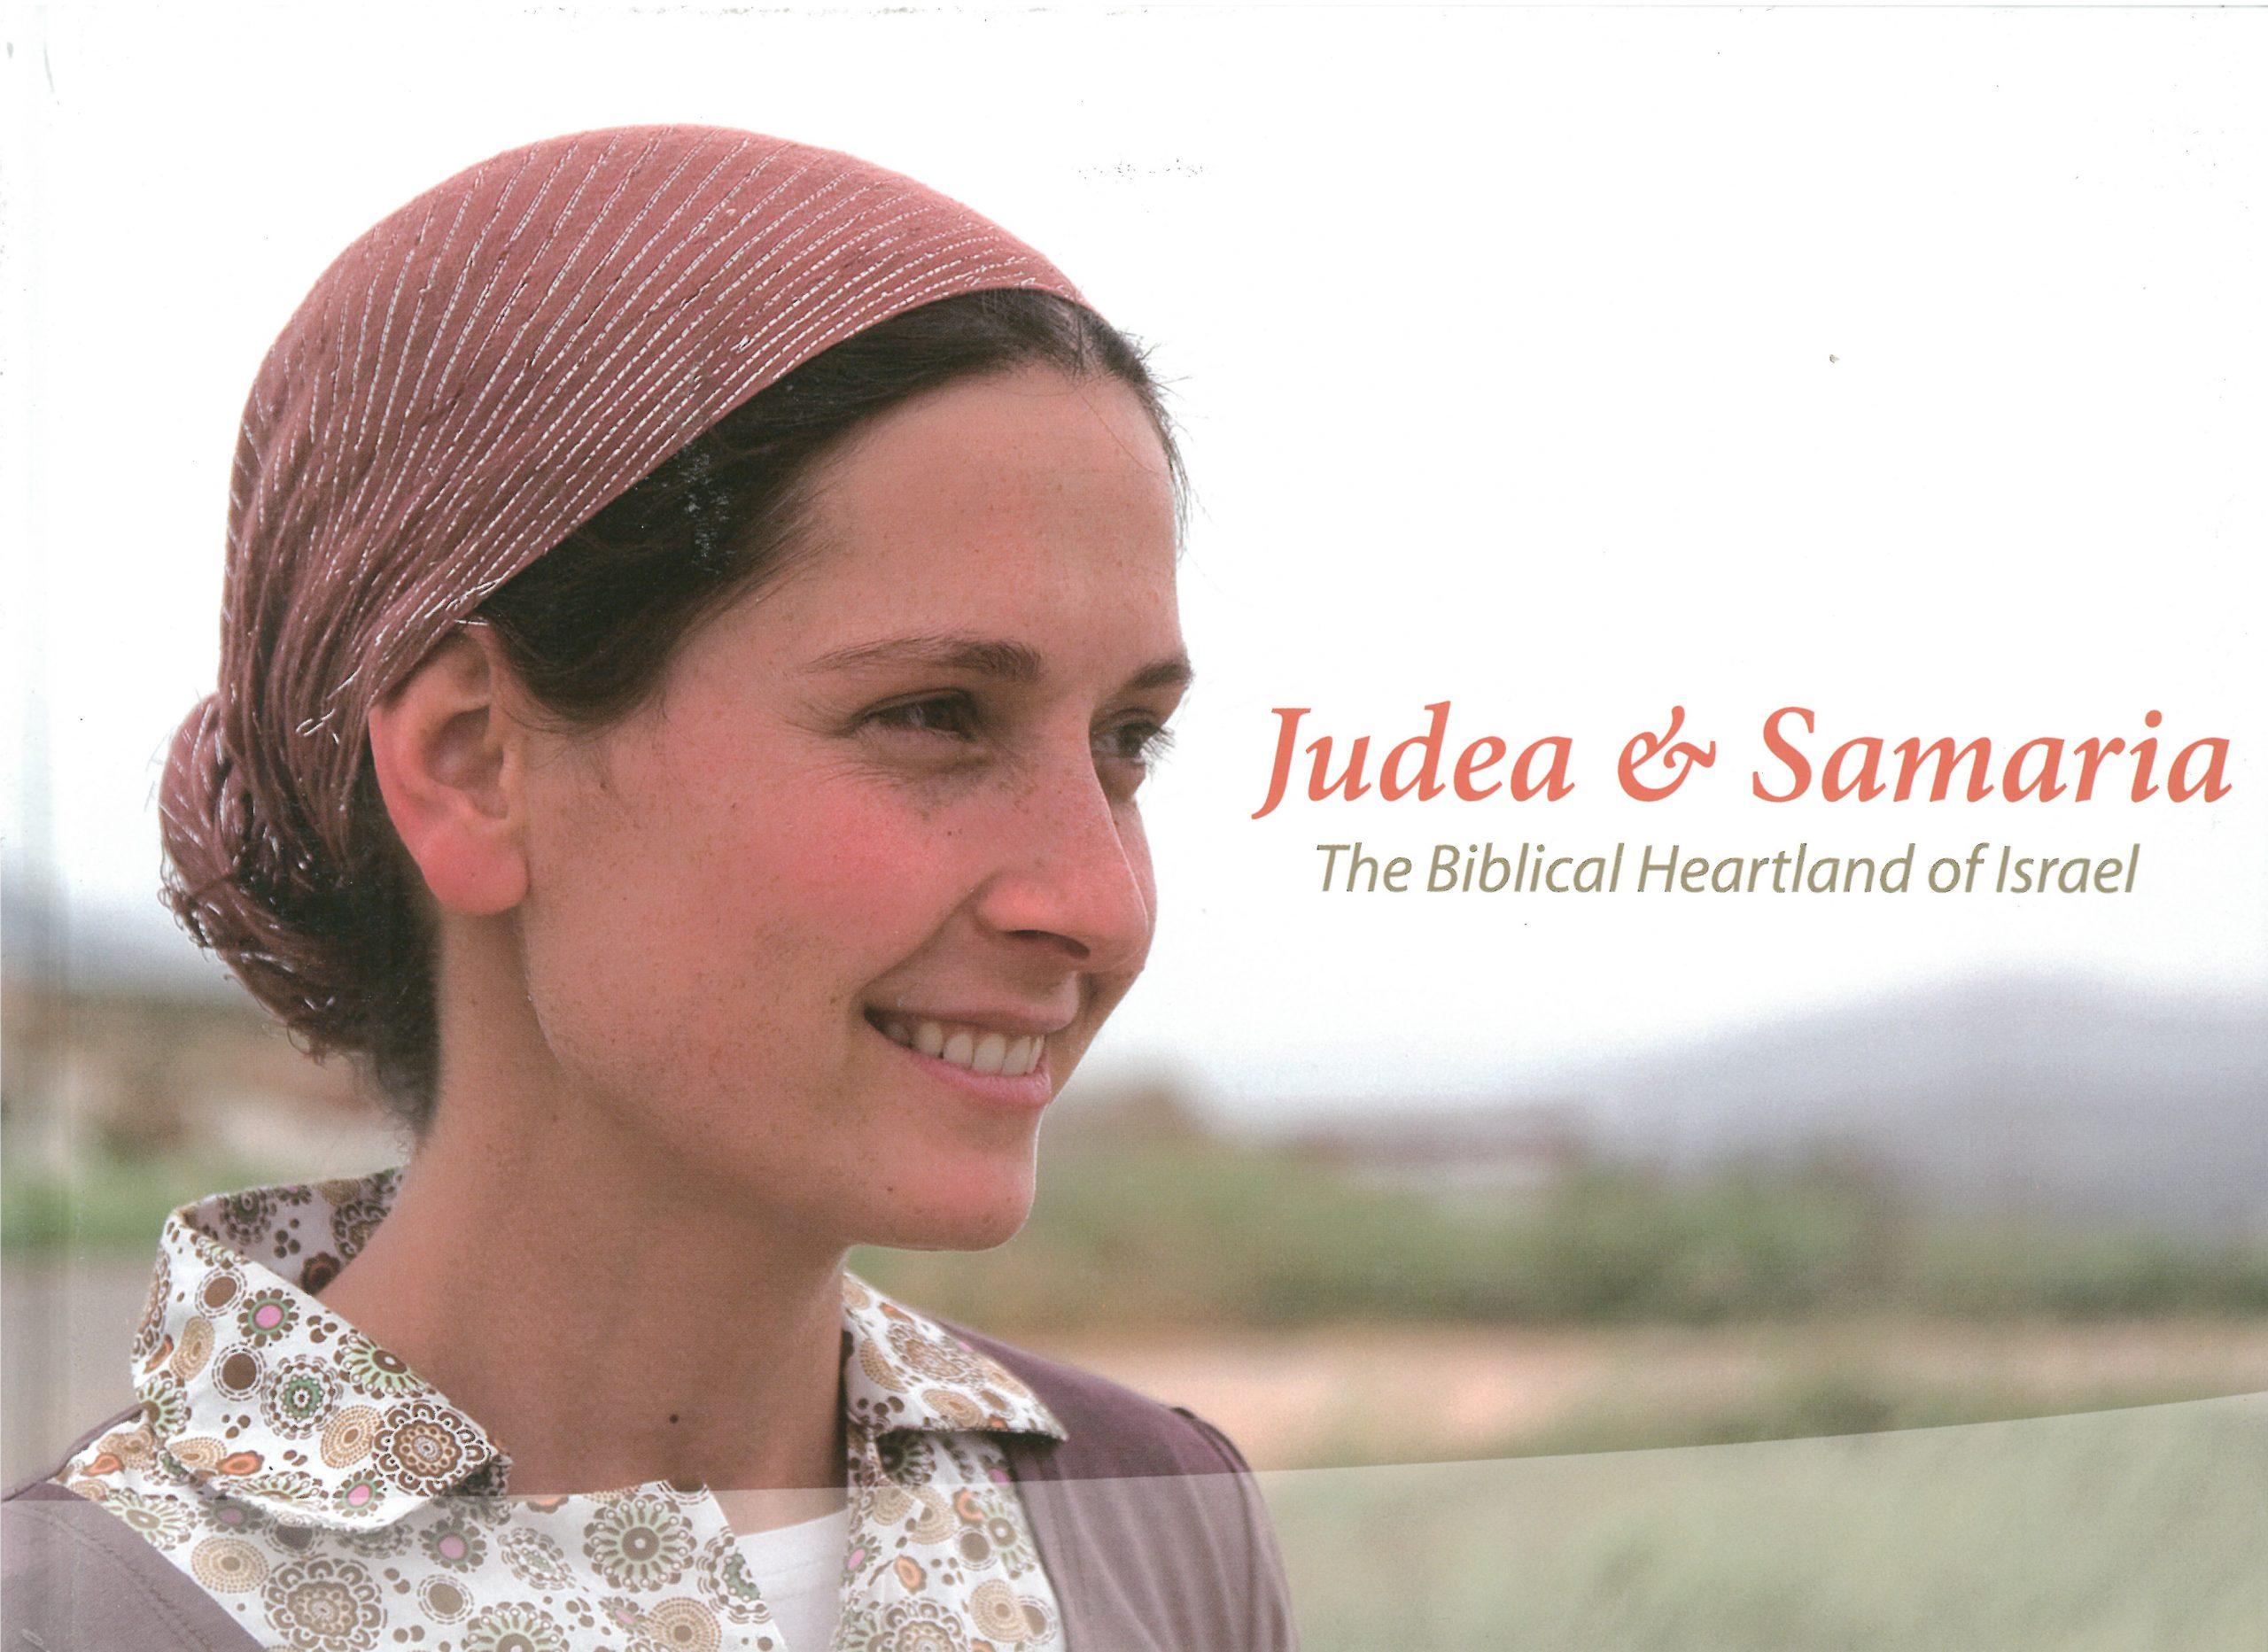 Judea and Samaria